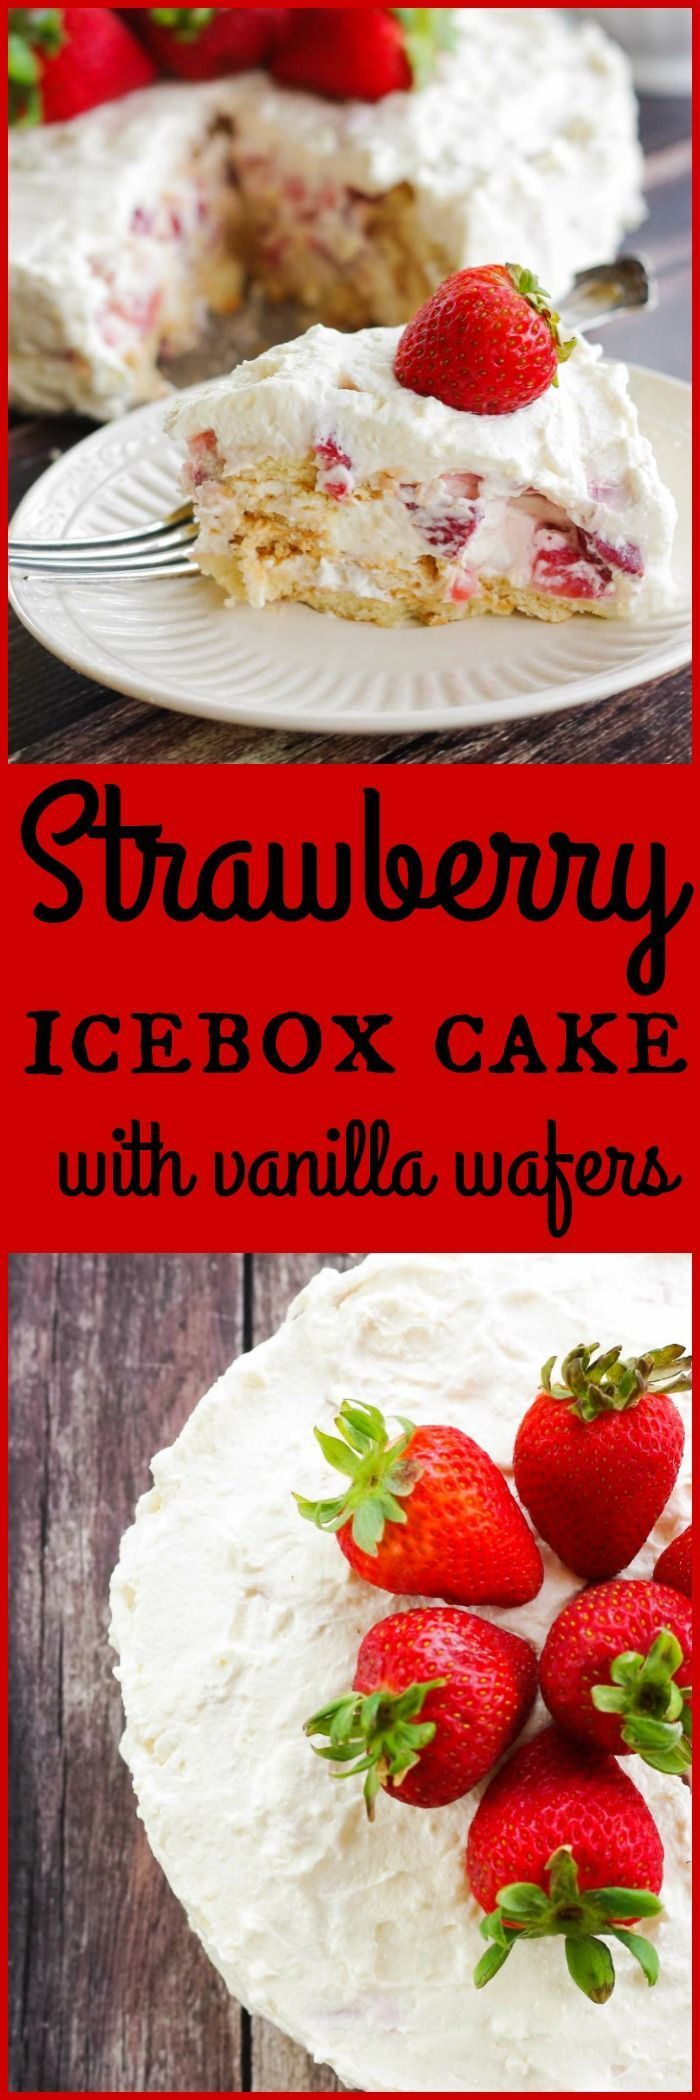 Strawberry Ice Box Cake with Vanilla Wafers | www.homeandplate.com | My Strawberry Ice Box Cake is an ideal way to kick off your summer celebrations. The key ingredient - Keebler Vanilla Wafers.#BiteSizedBitsOfJoy #ad